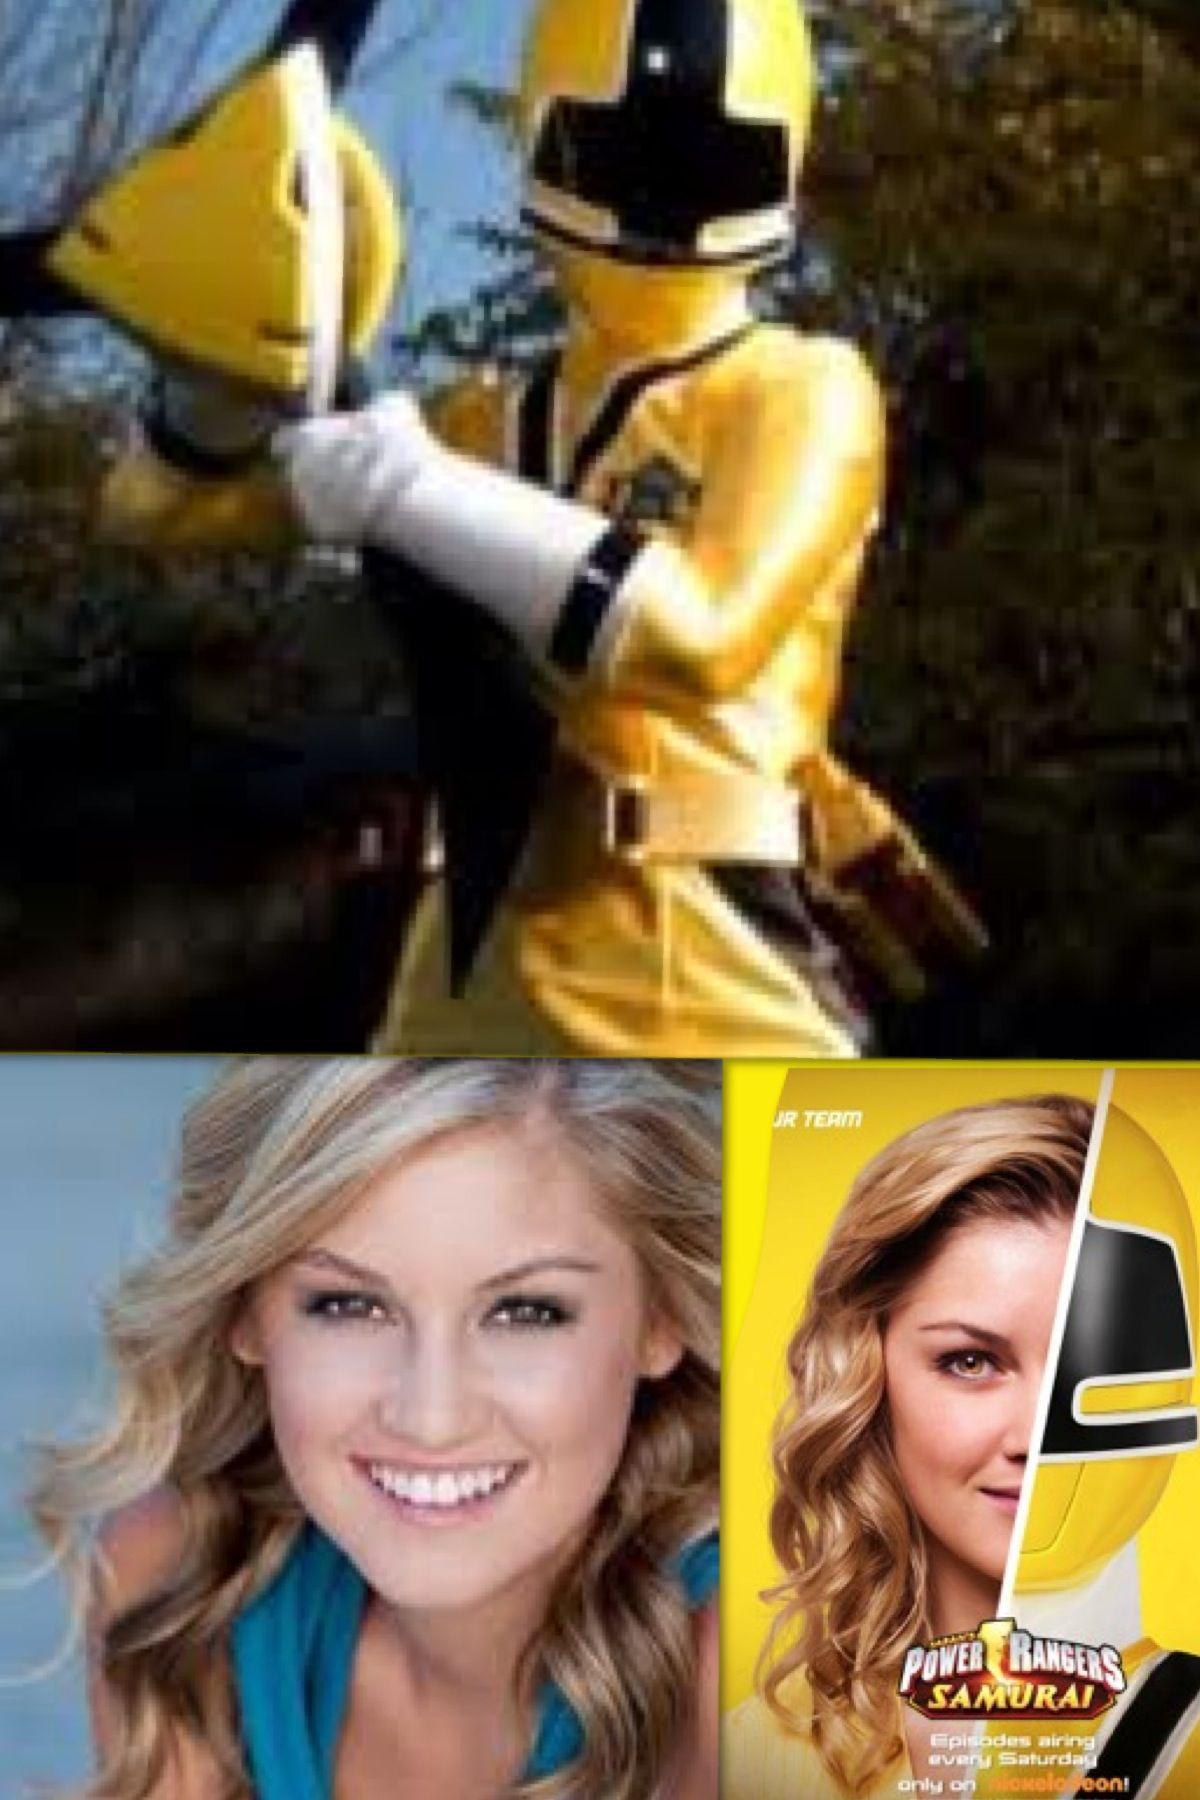 Emily the yellow samurai power ranger played by brittany pirtle power rangers pinterest - Power ranger samurai rose ...